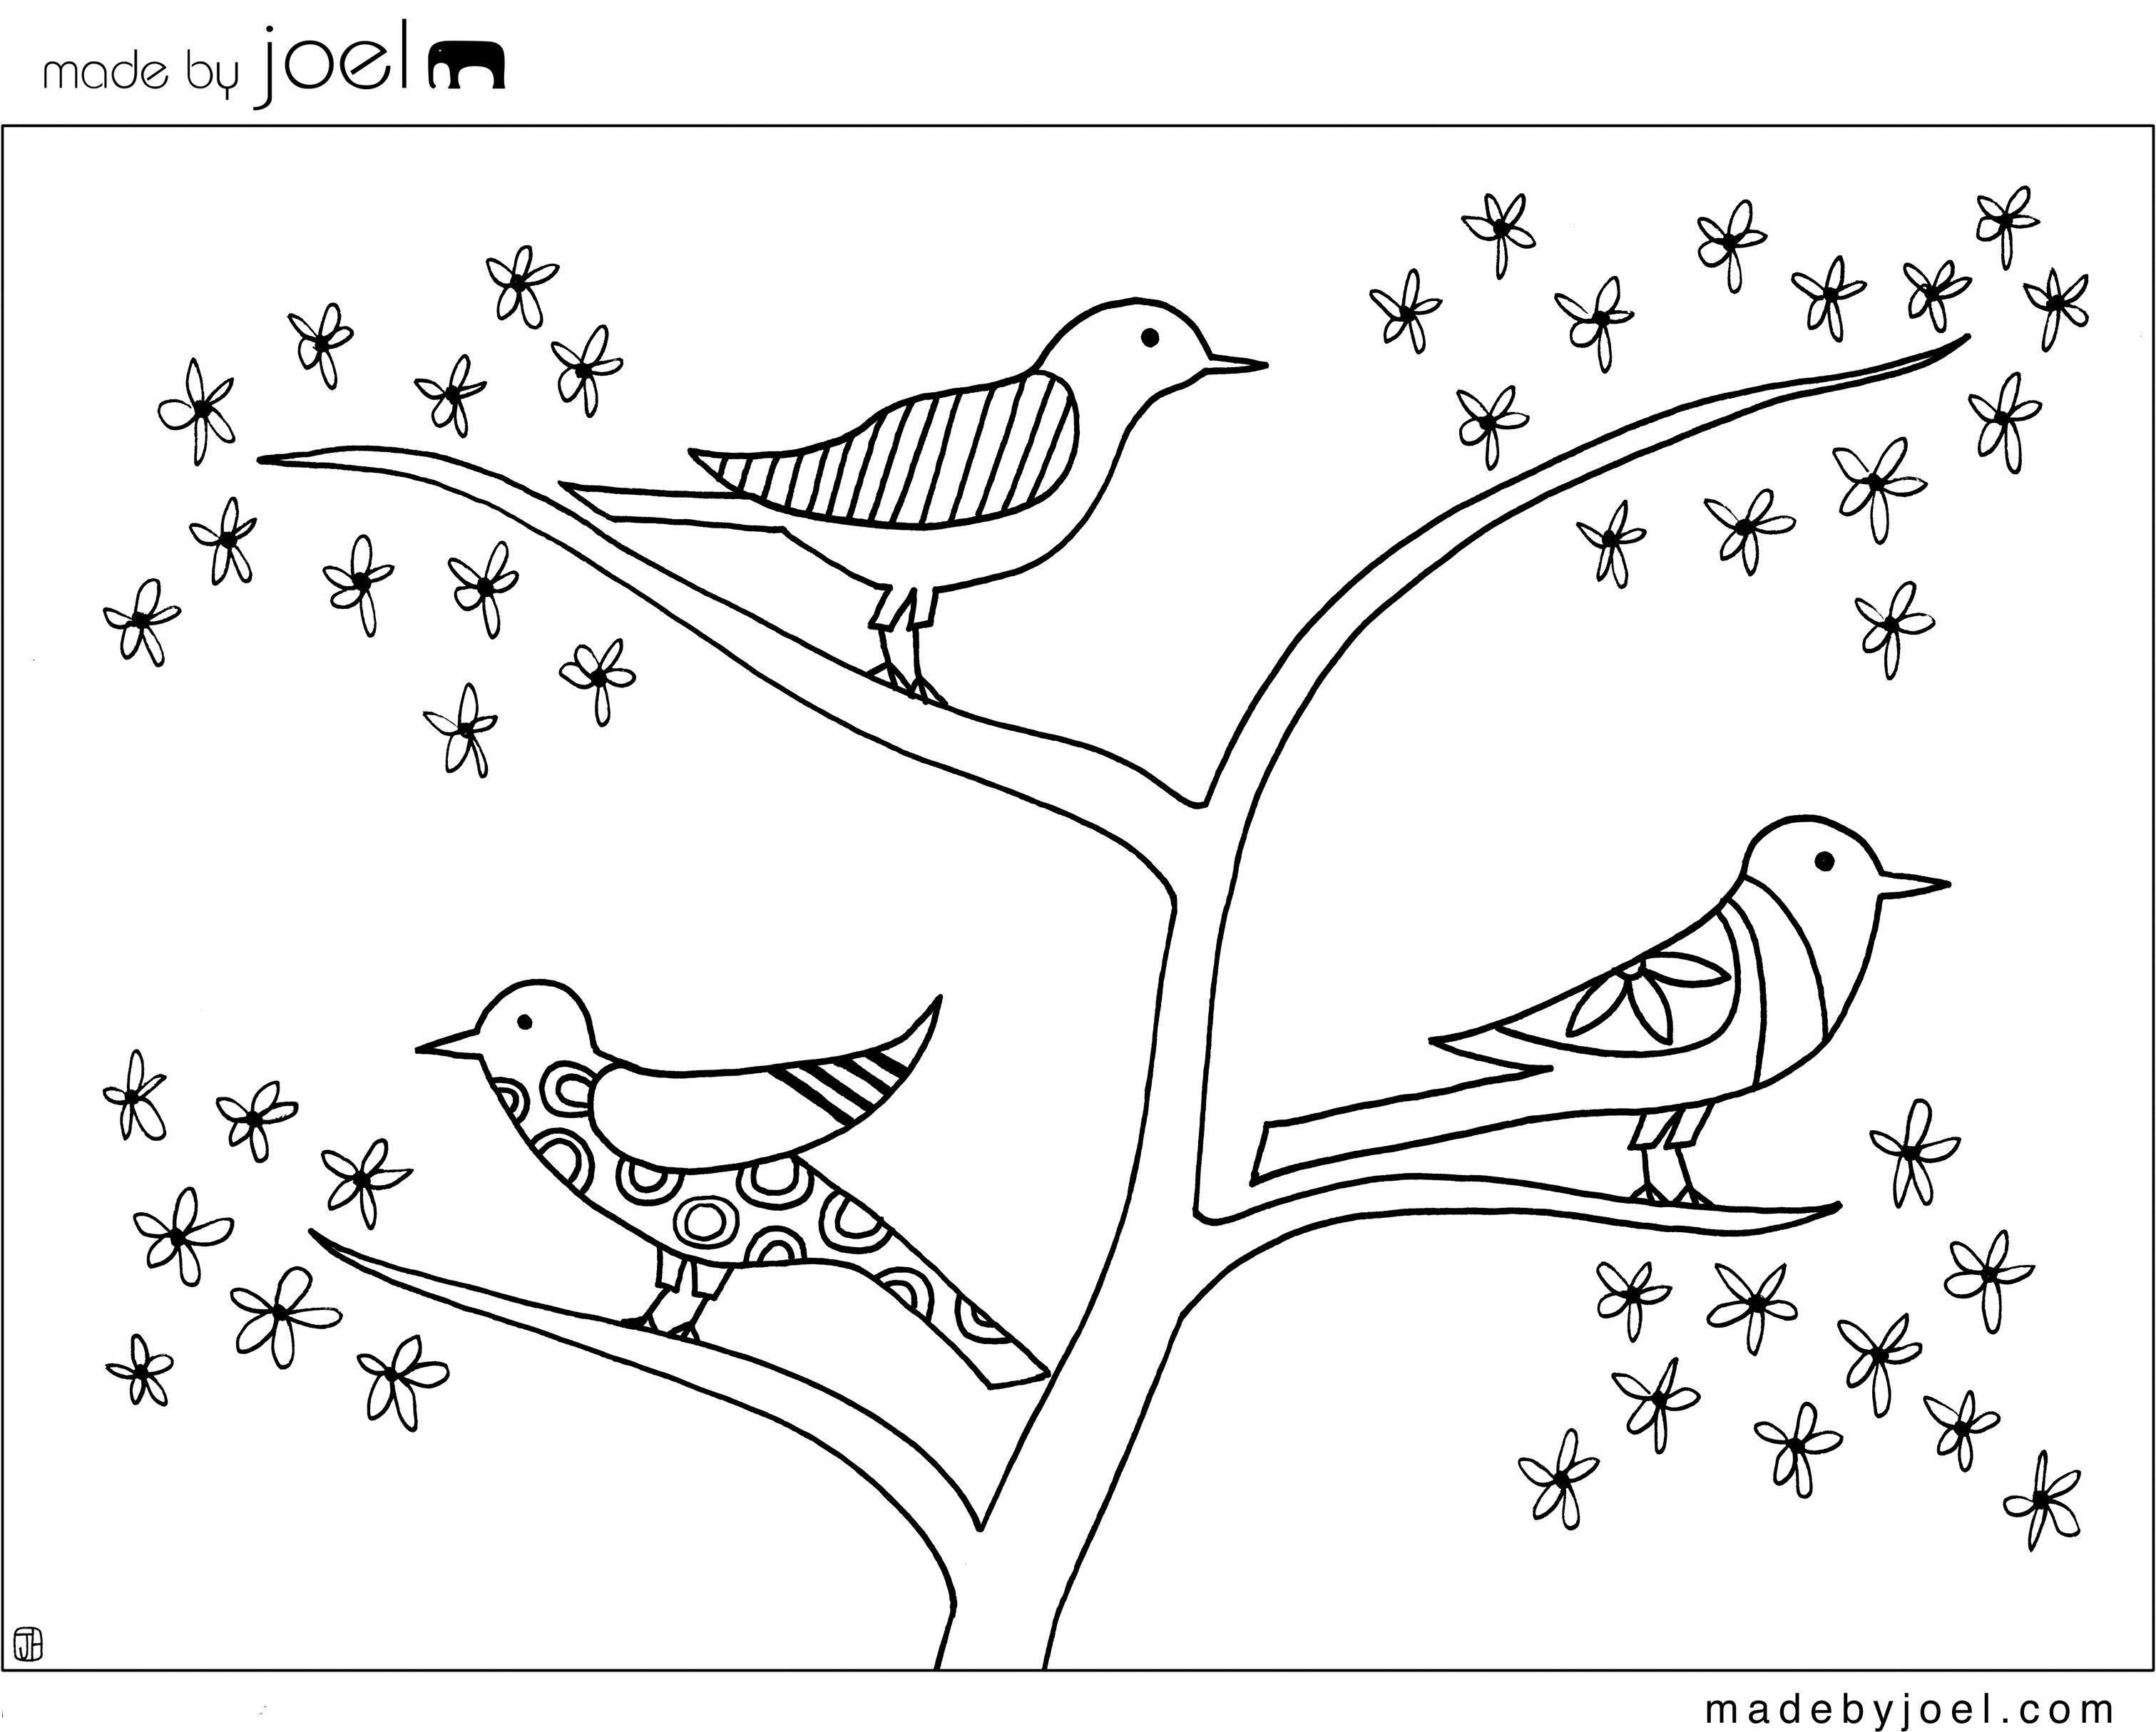 Made By Joel Flower Tree Birds Coloring Sheet